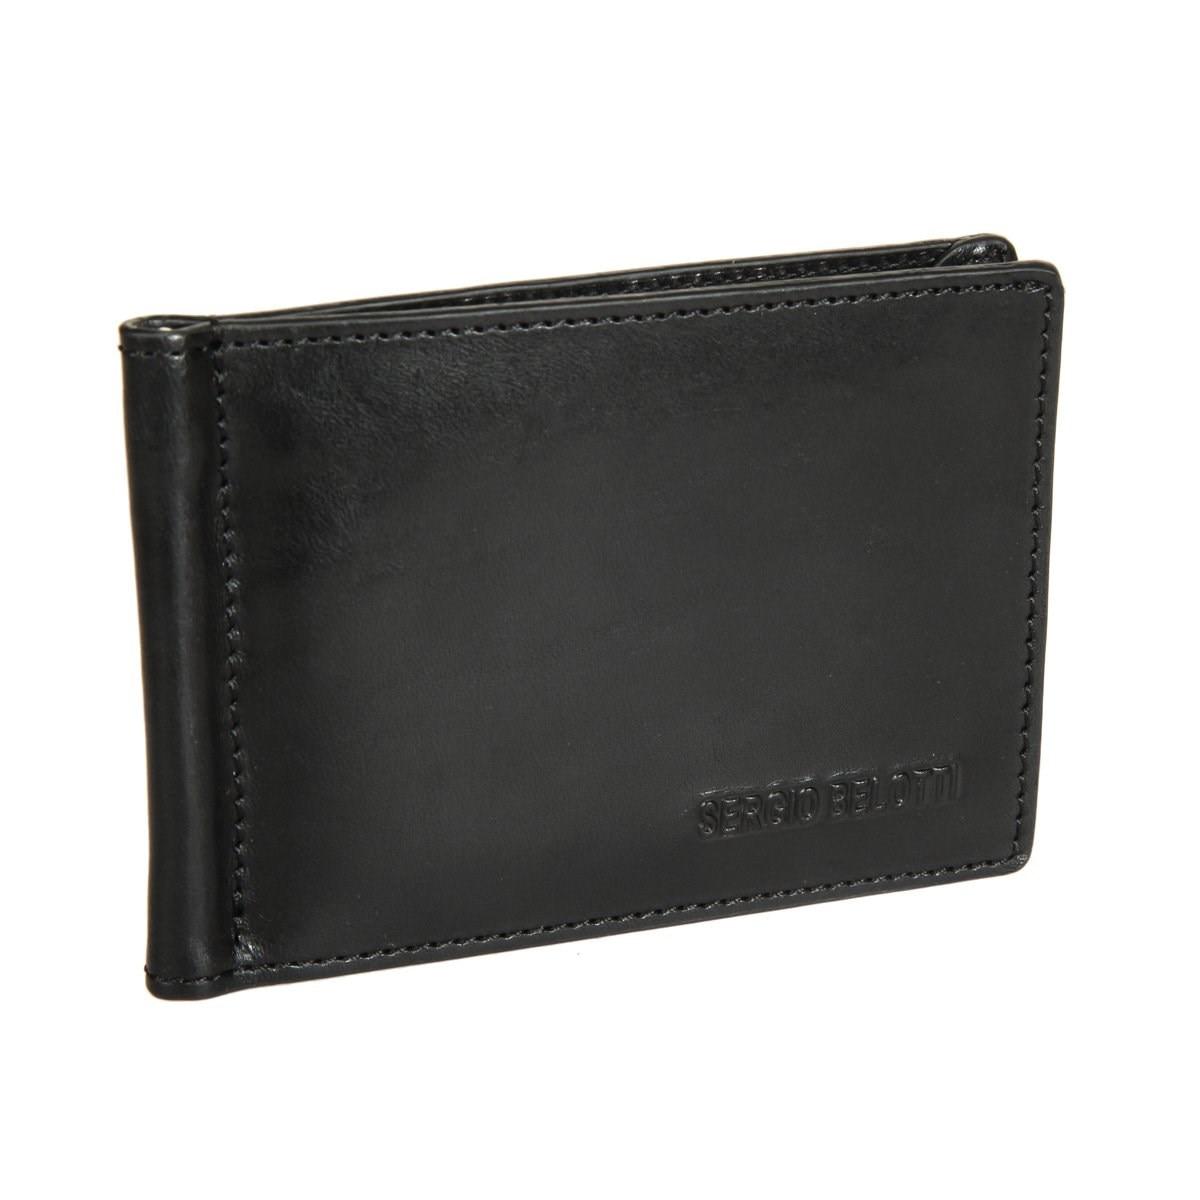 Money clip Sergio Belotti 3589 IRIDO black edcgear abs double sides slim money clip card holder